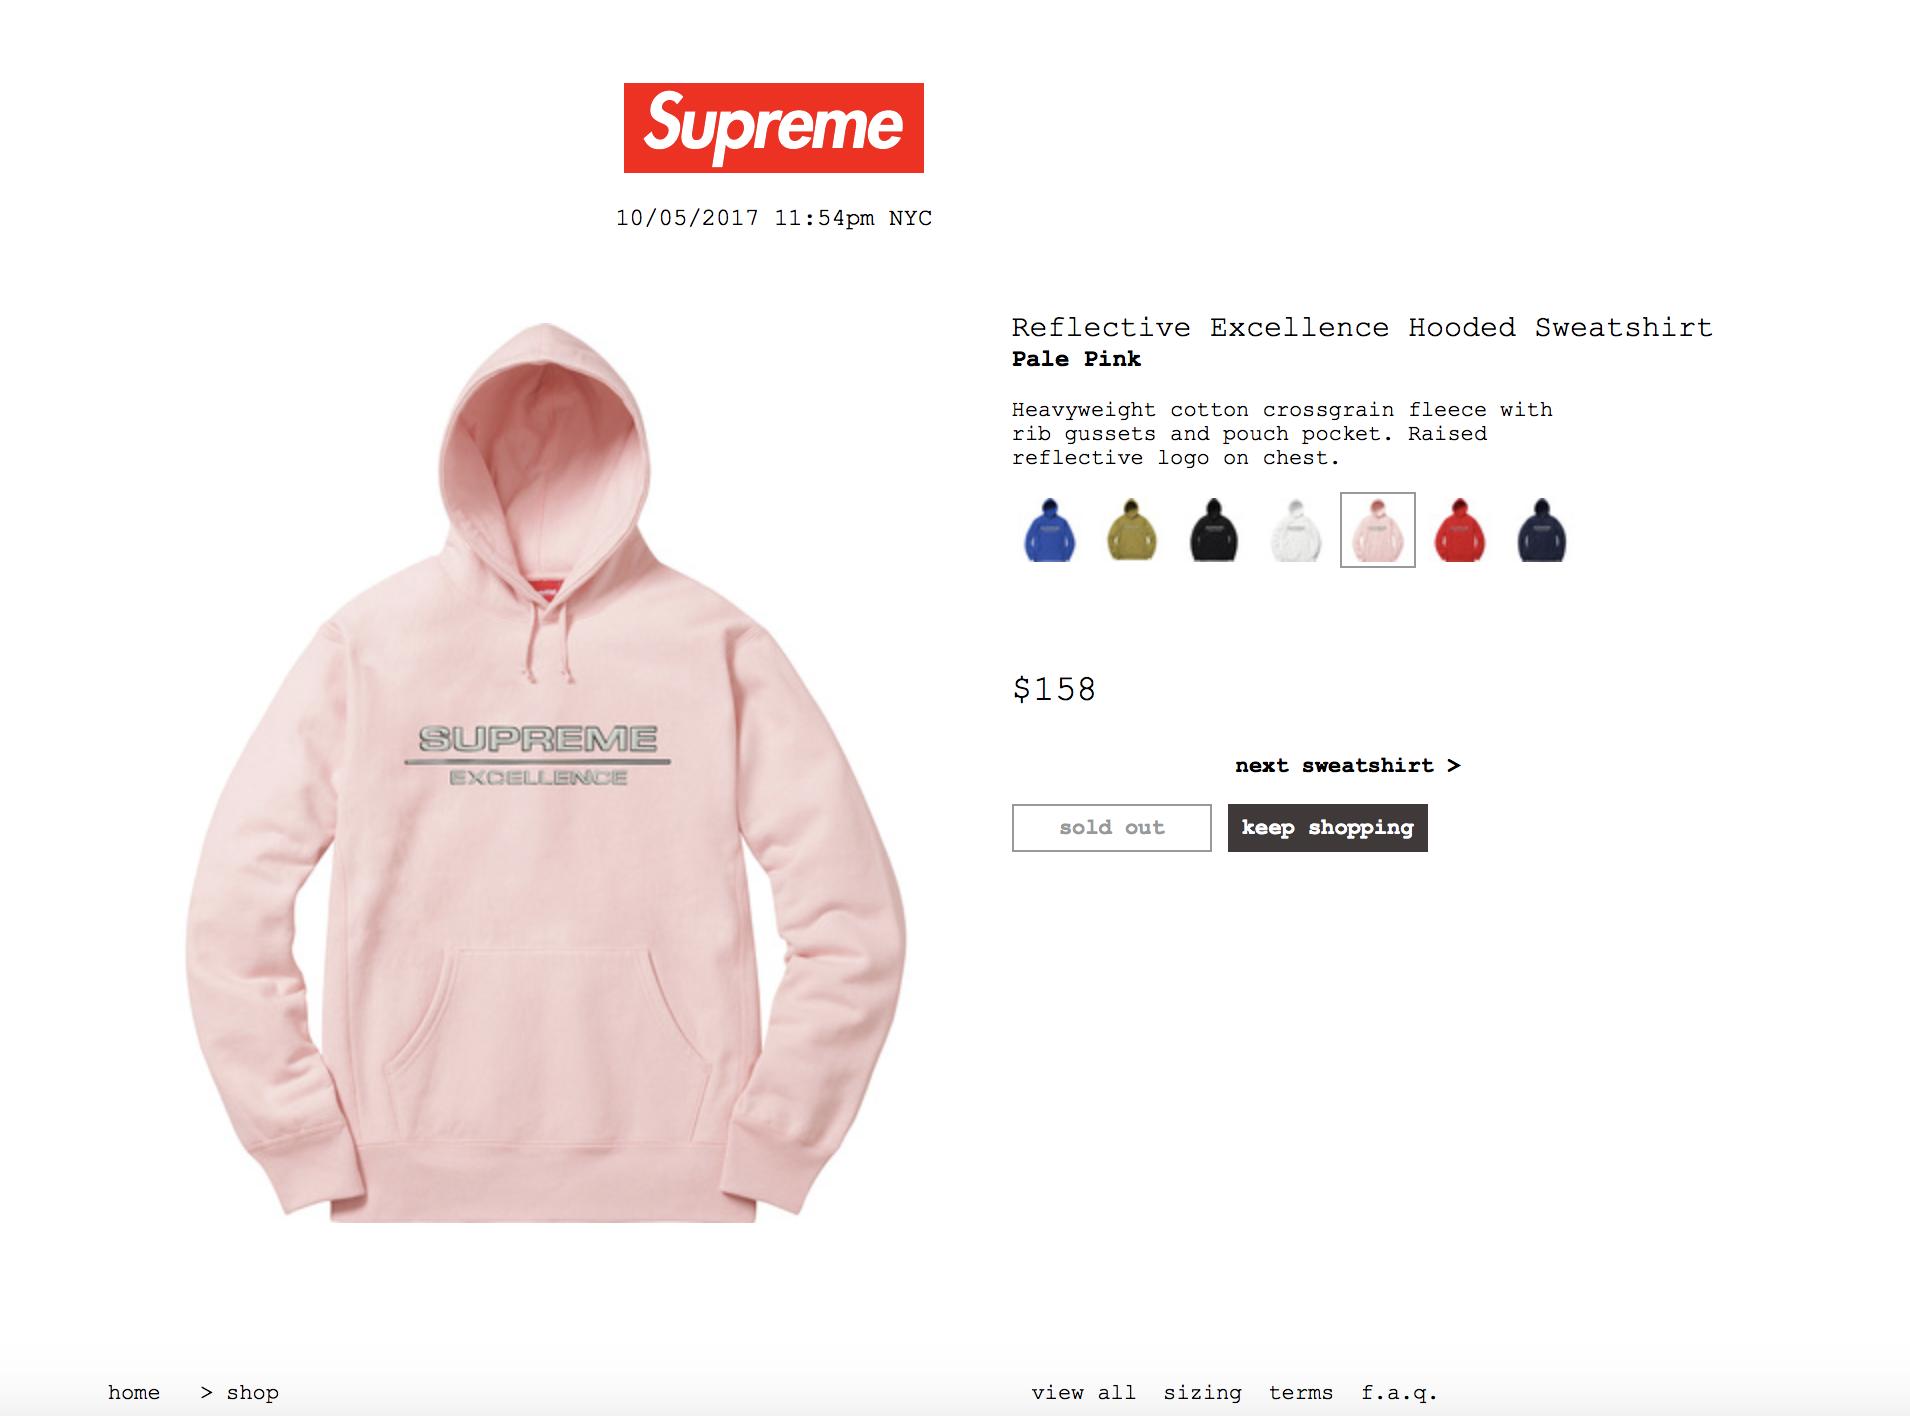 Supreme Supreme Reflective Excellence Hooded Sweatshirt Pink [ 1416 x 1910 Pixel ]